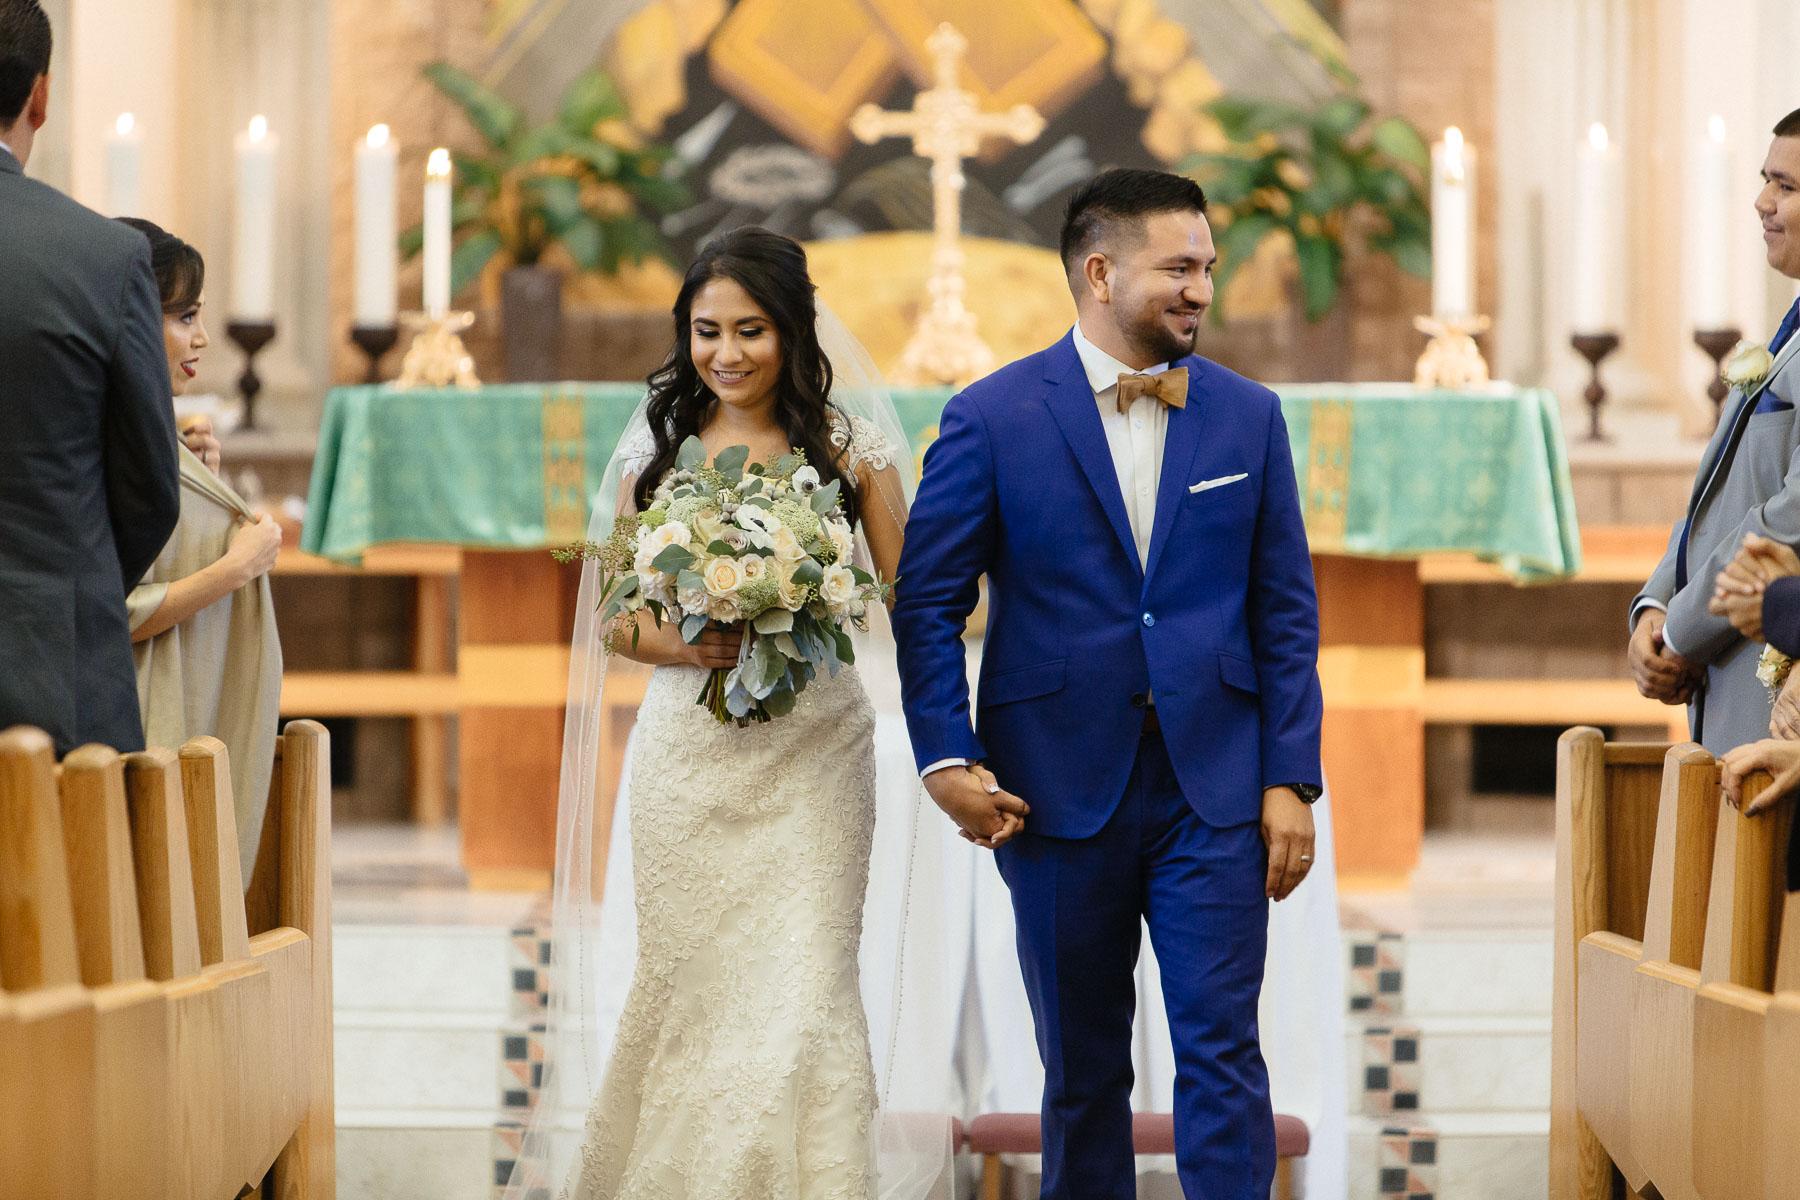 161029-Luxium-Weddings-Arizona-Jeff-Griselda-First-Look-Val-Vista-Lakes-Gilber-044.jpg